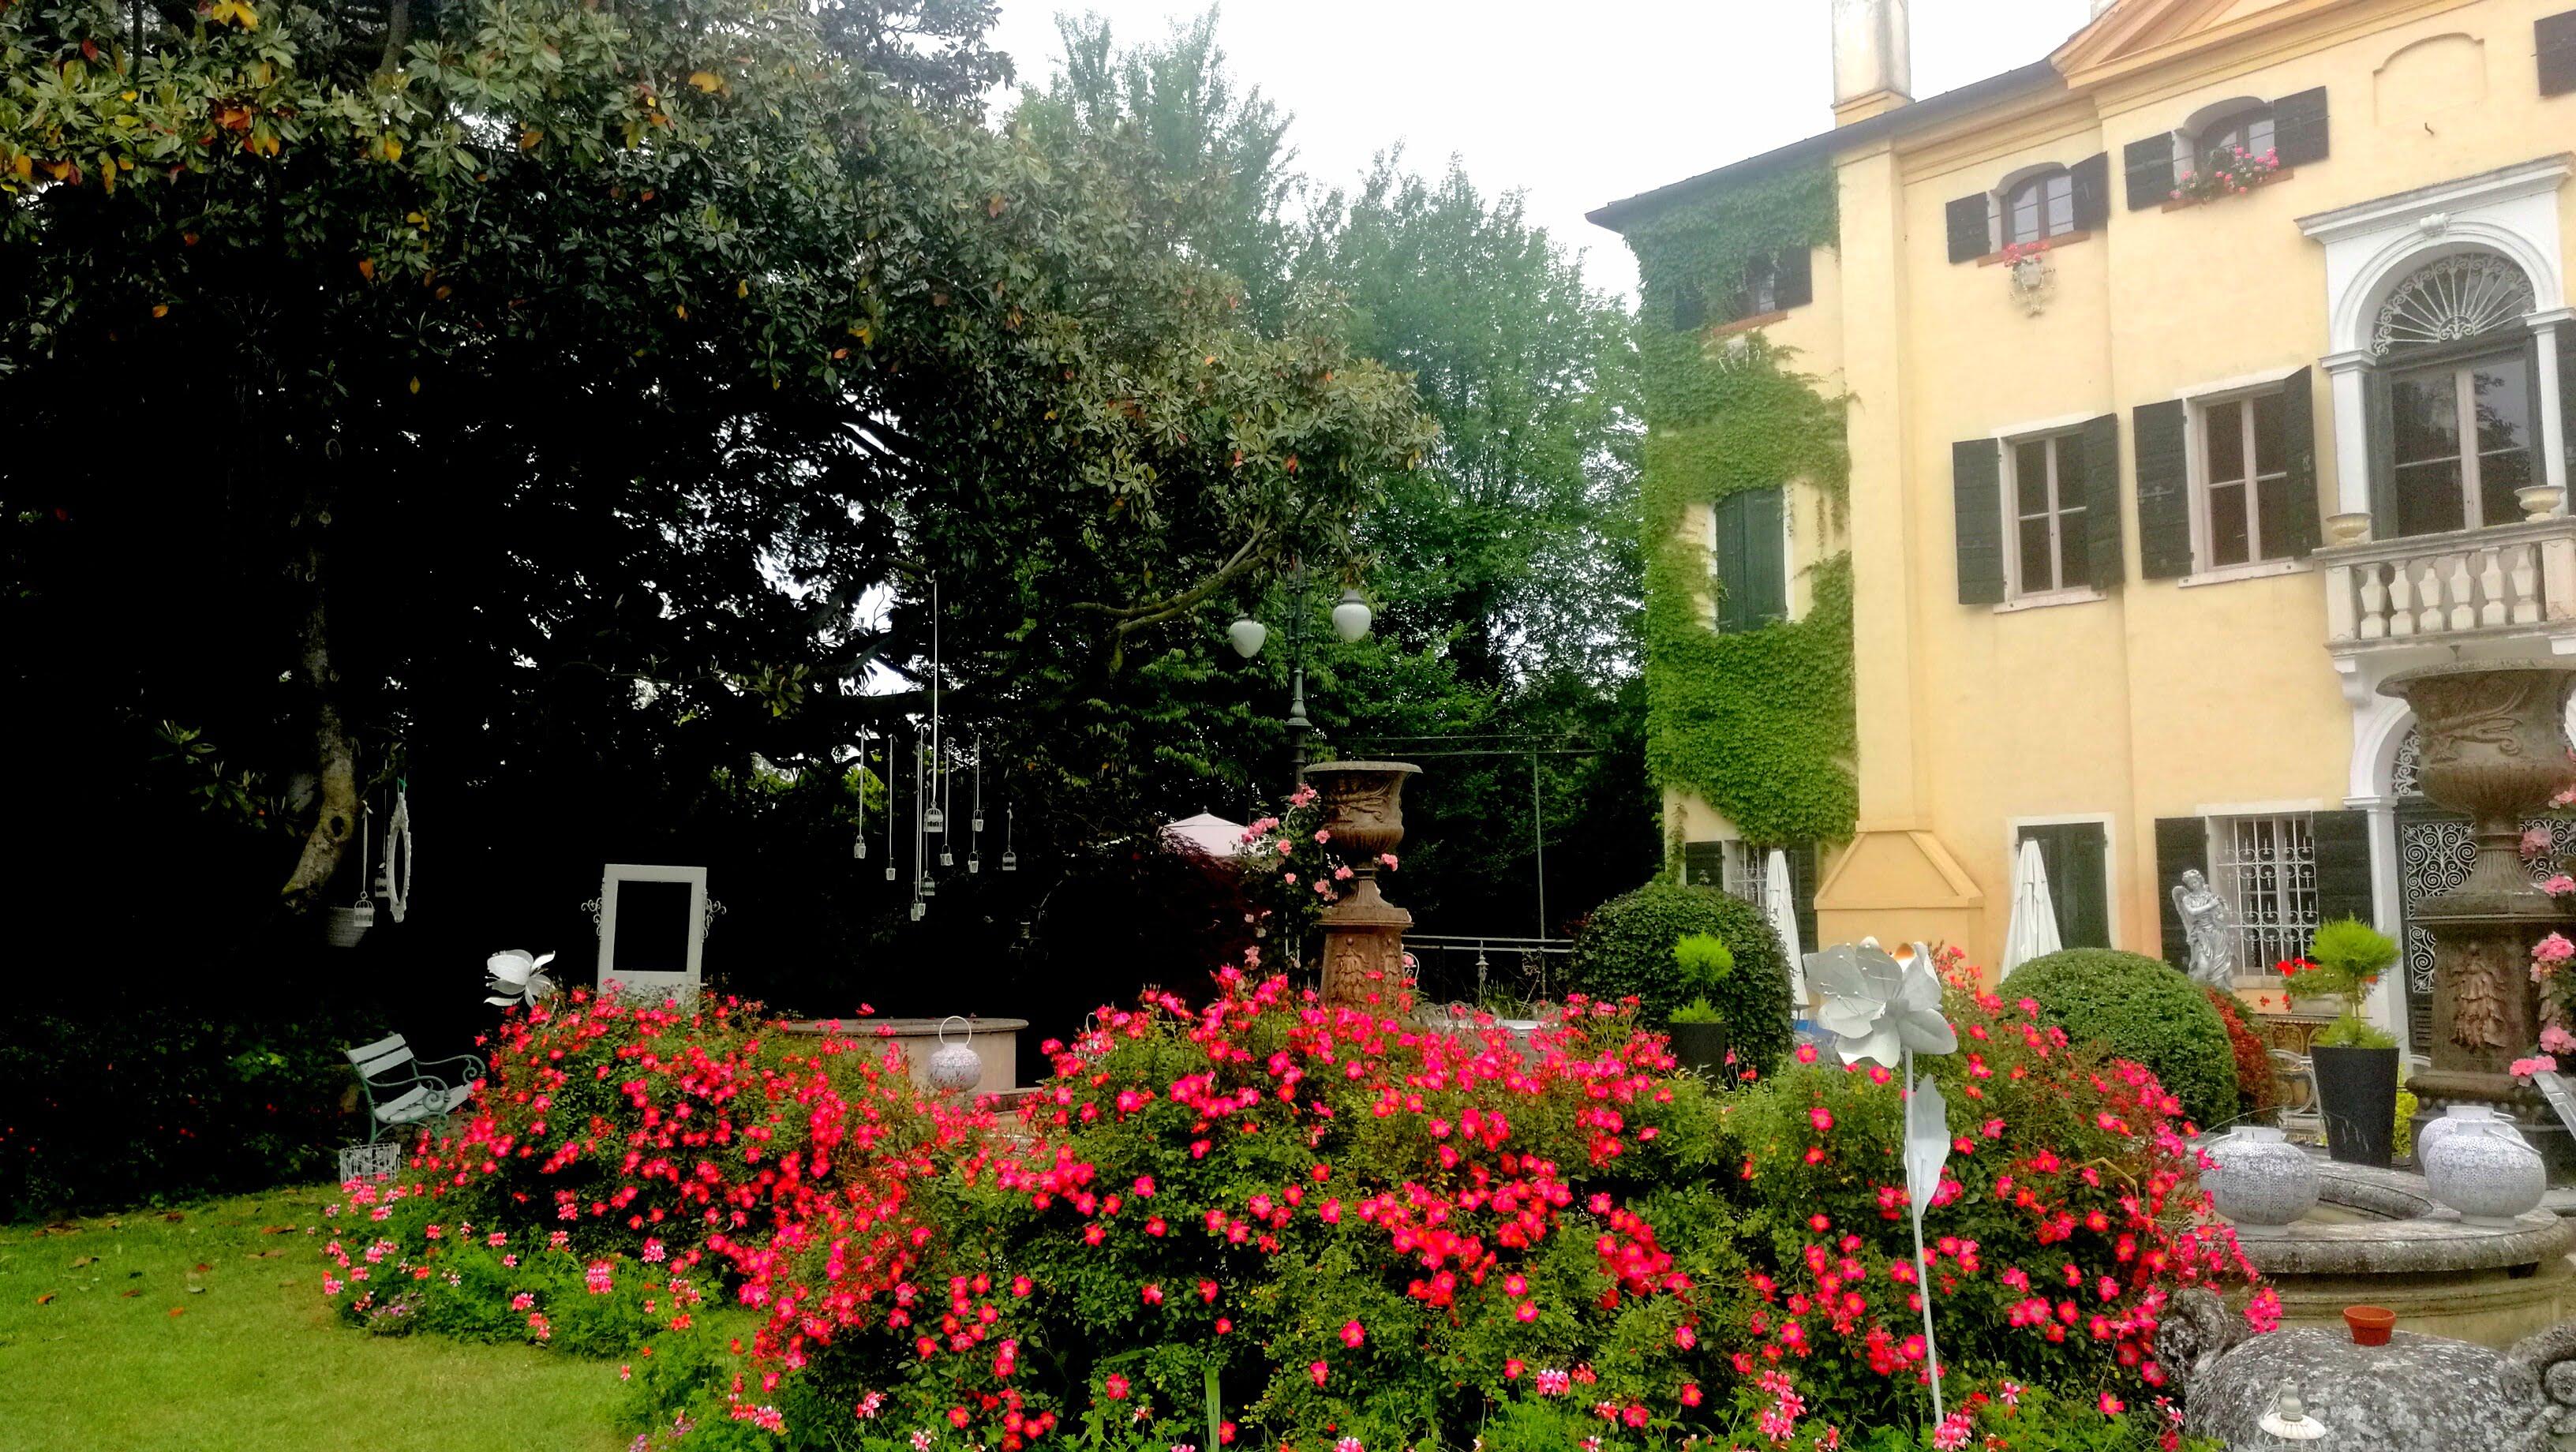 LUXURY WEDDING IN ITALY BY VILLA SELMI